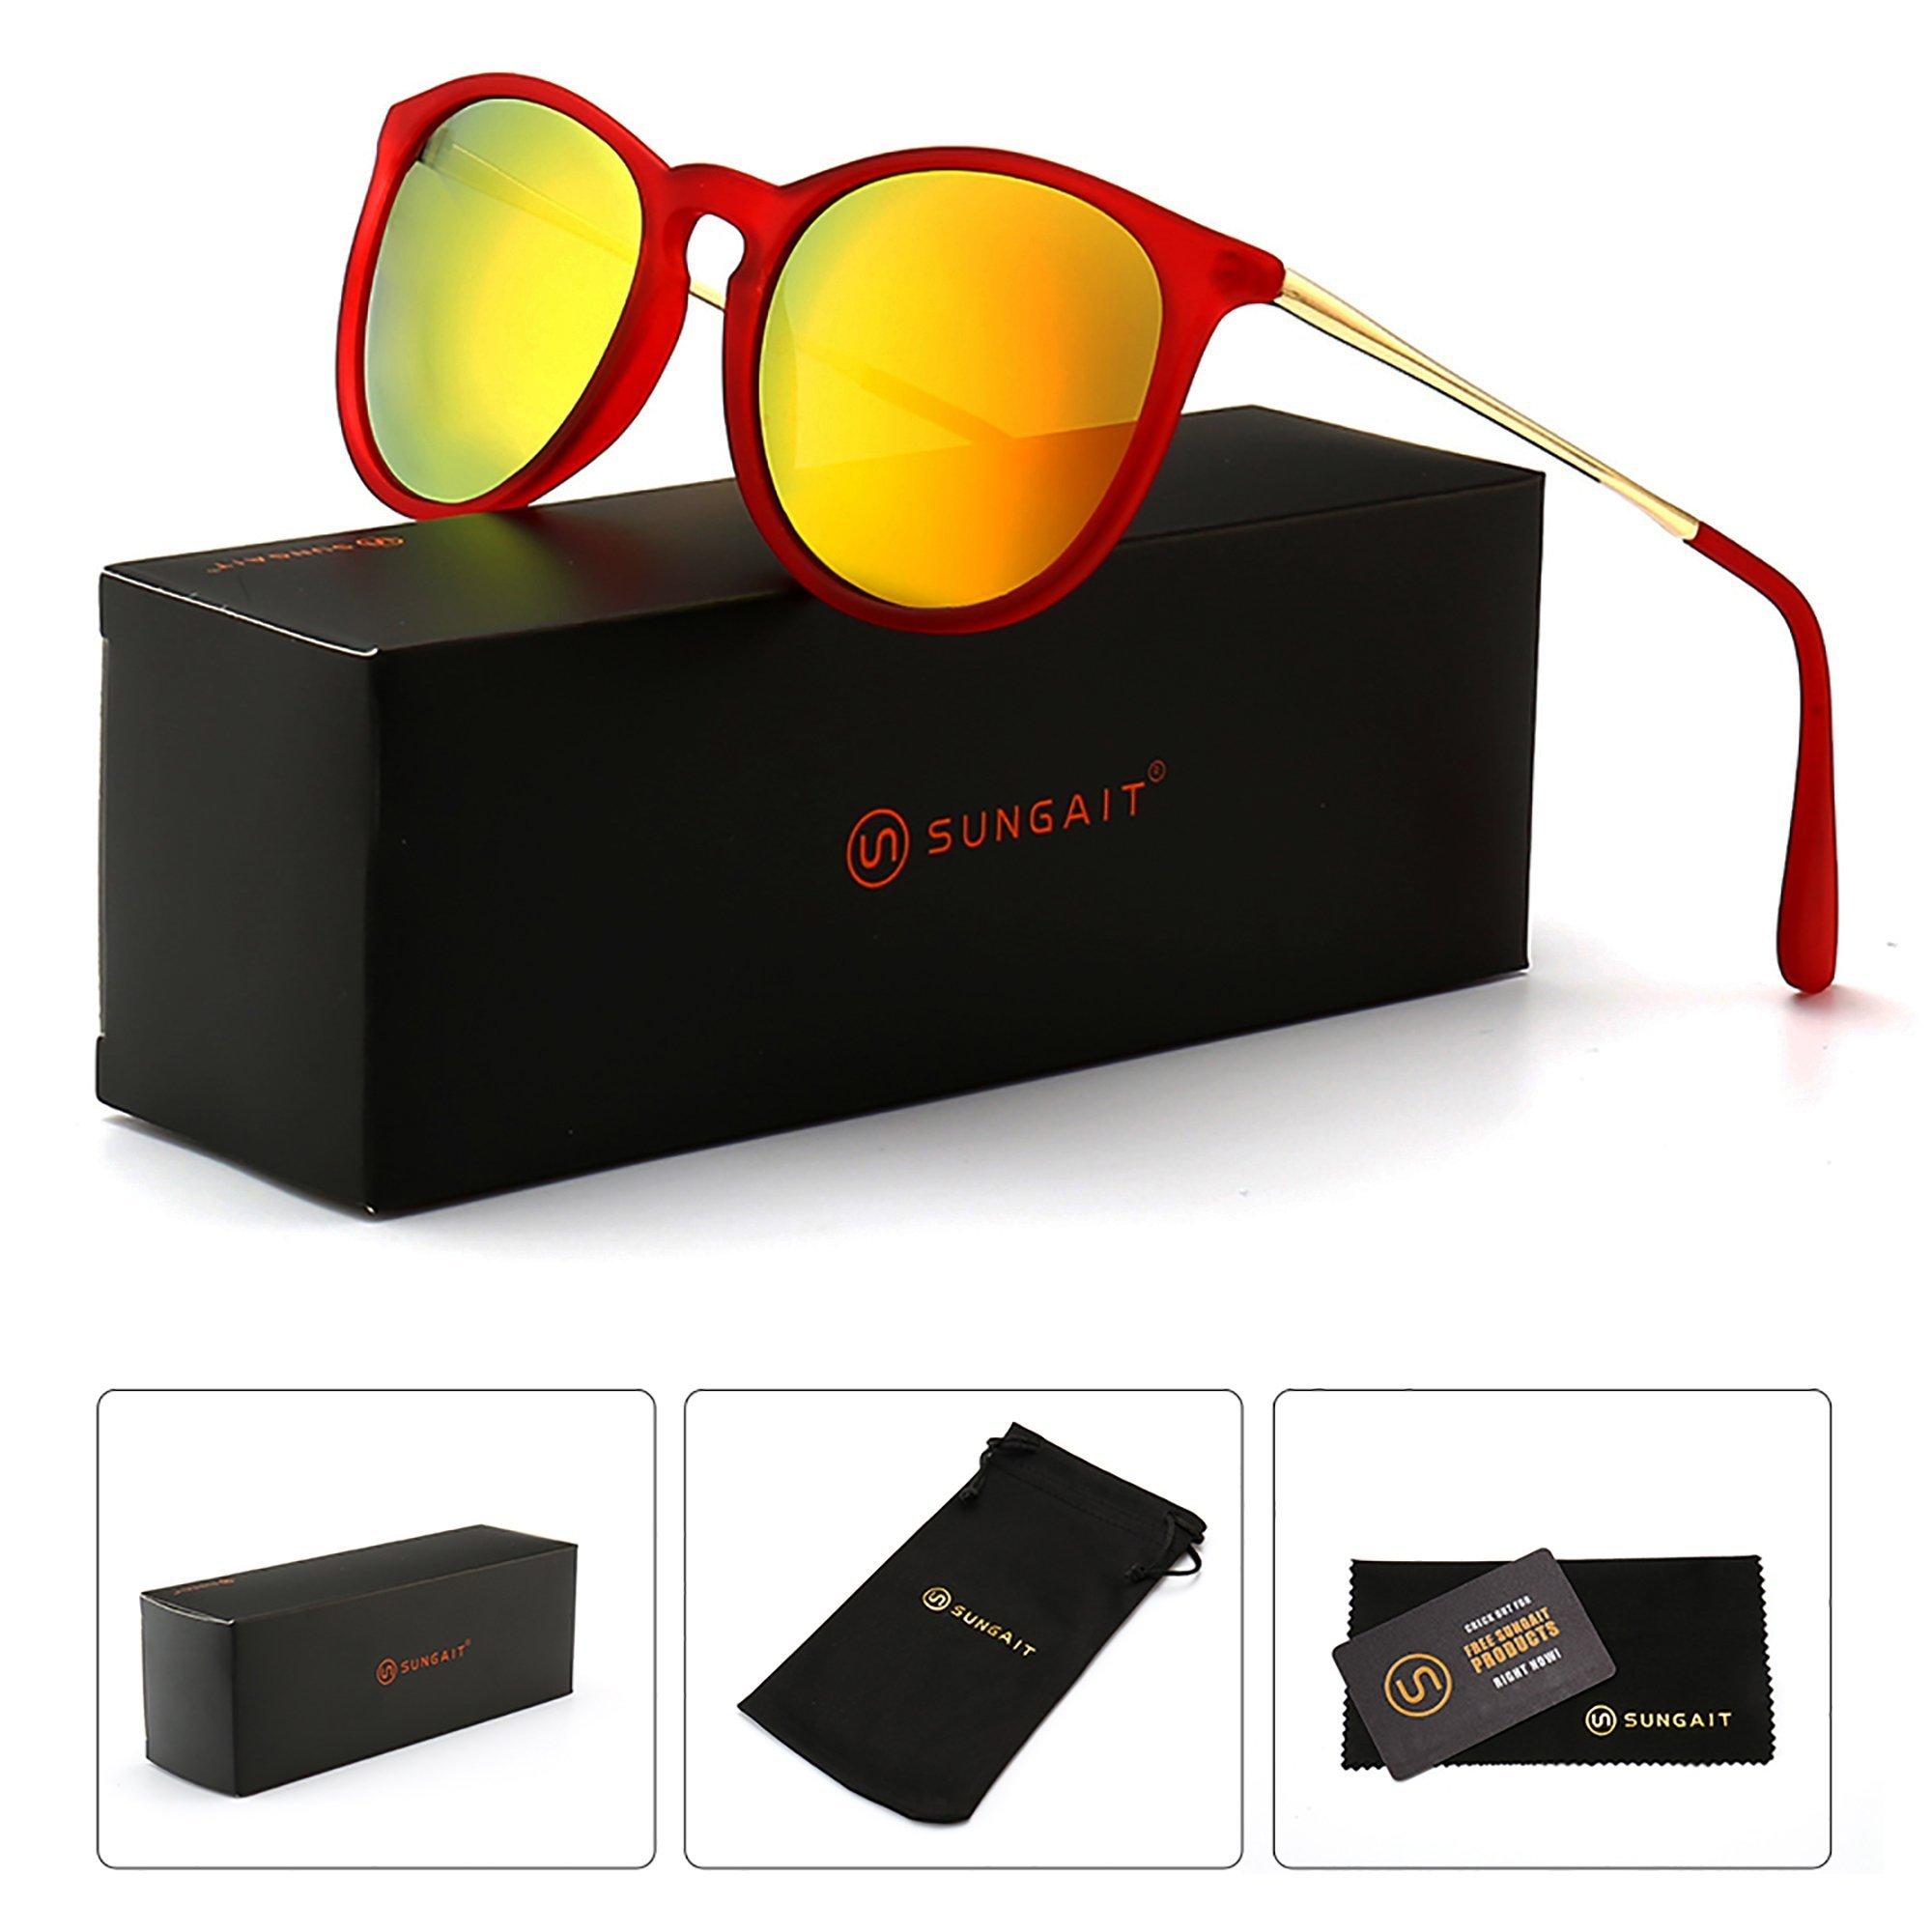 SUNGAIT Vintage Round Sunglasses for Women Classic Retro Designer Style (Red Frame/Tangerine Lens) 1567 HOKJH